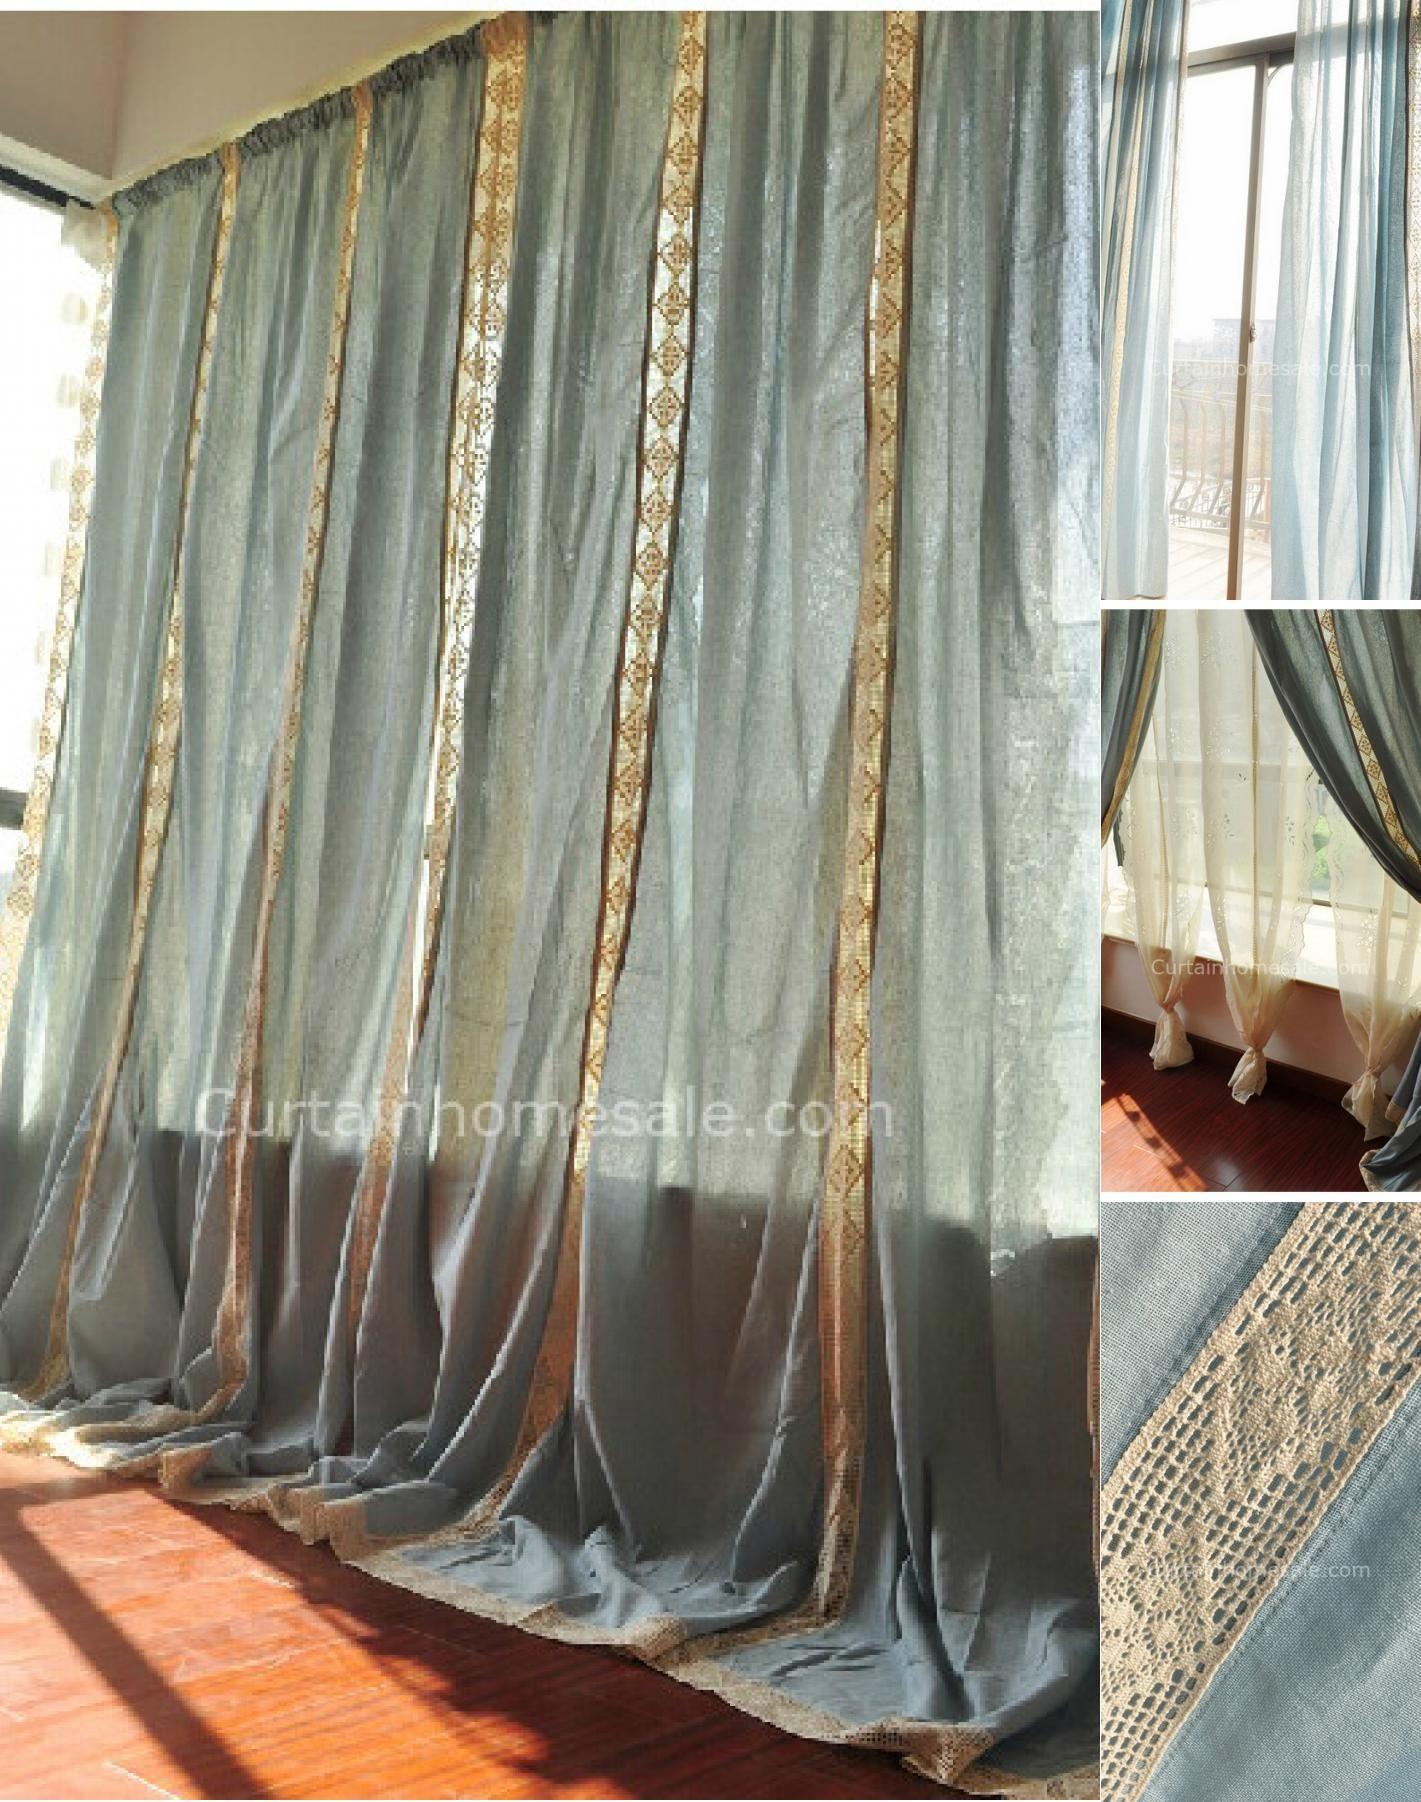 Eco Friendly Big Window Cotton Burlap Curtains Of Mediterranean